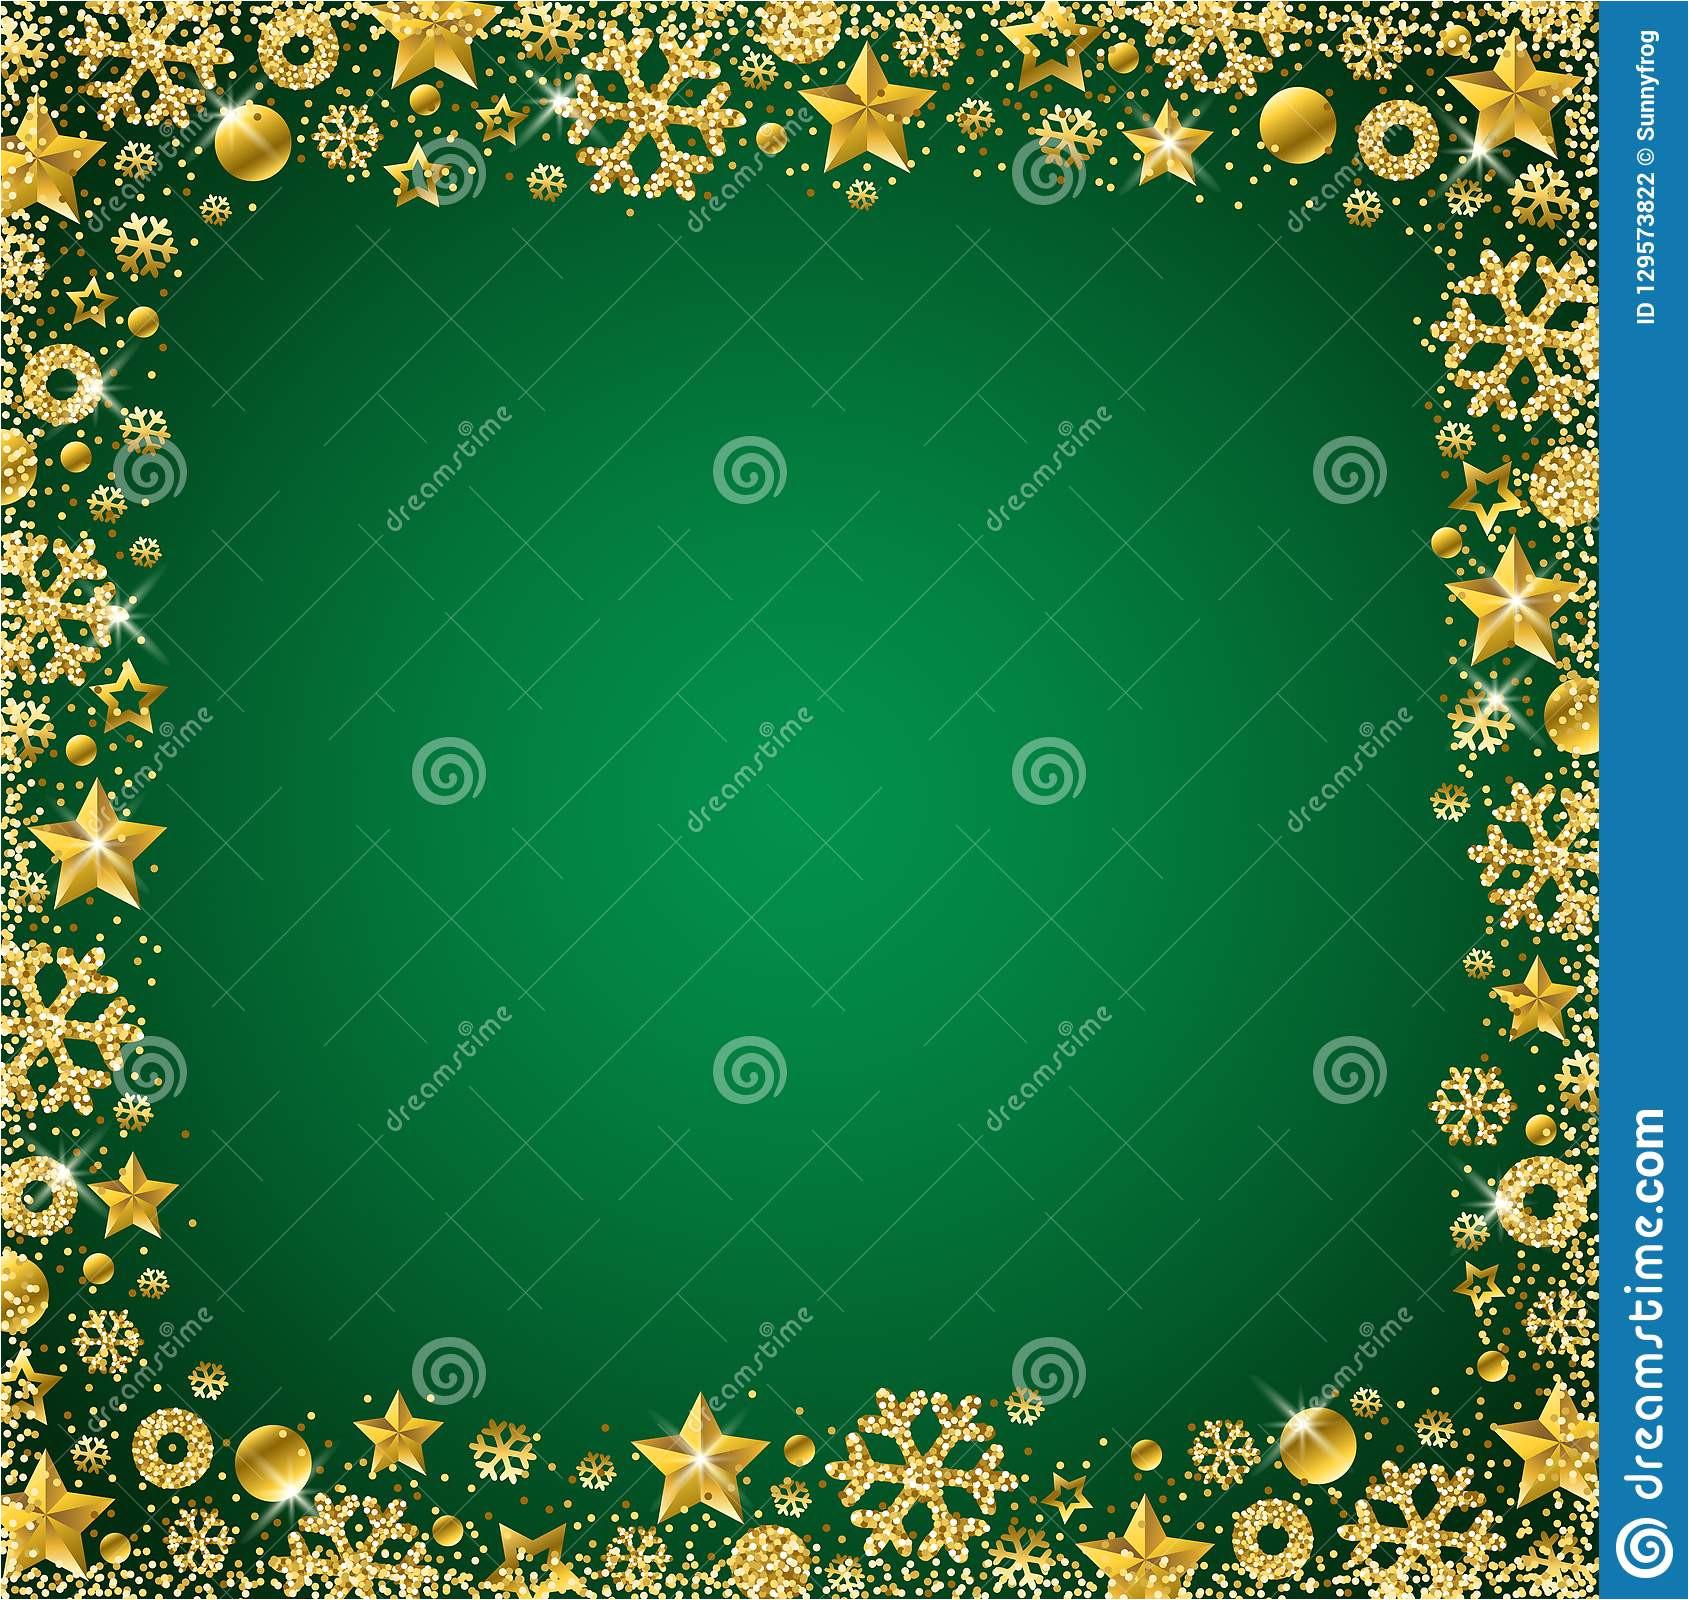 green christmas card border golden glittering snowflake snowflakes stars vector illustration 129573822 jpg